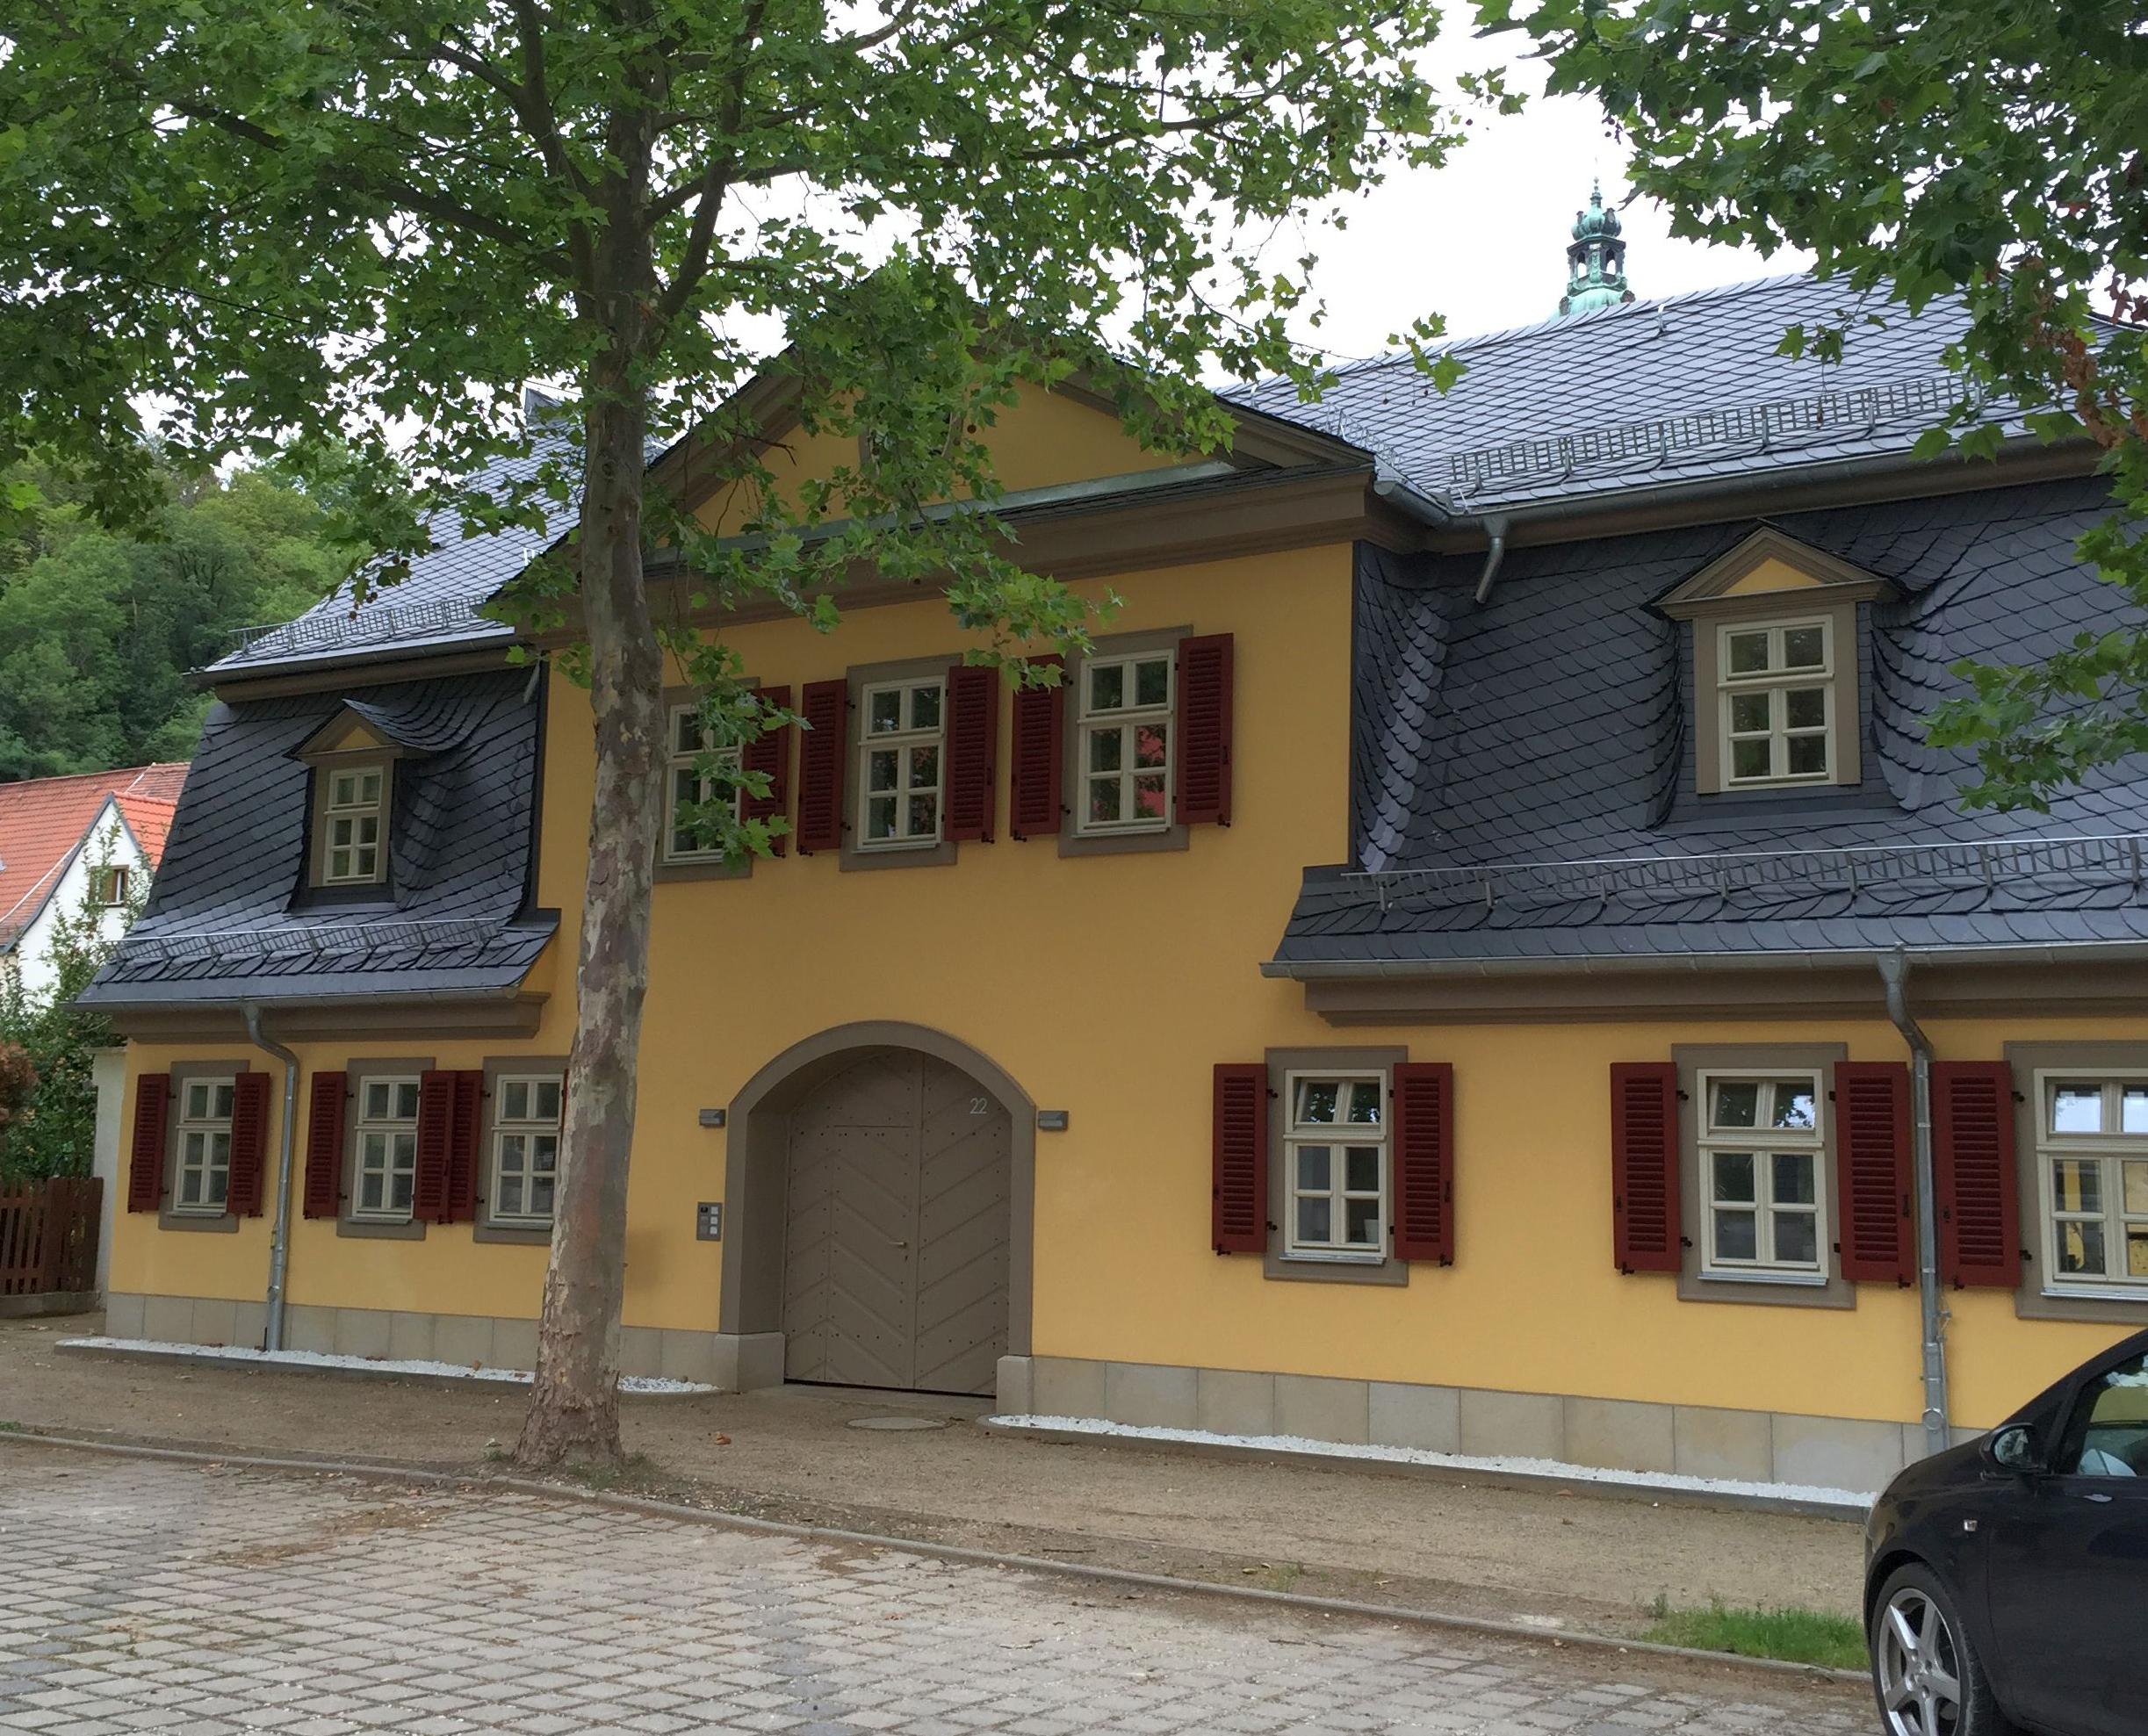 Wohnung Saalfeld Rudolstadt